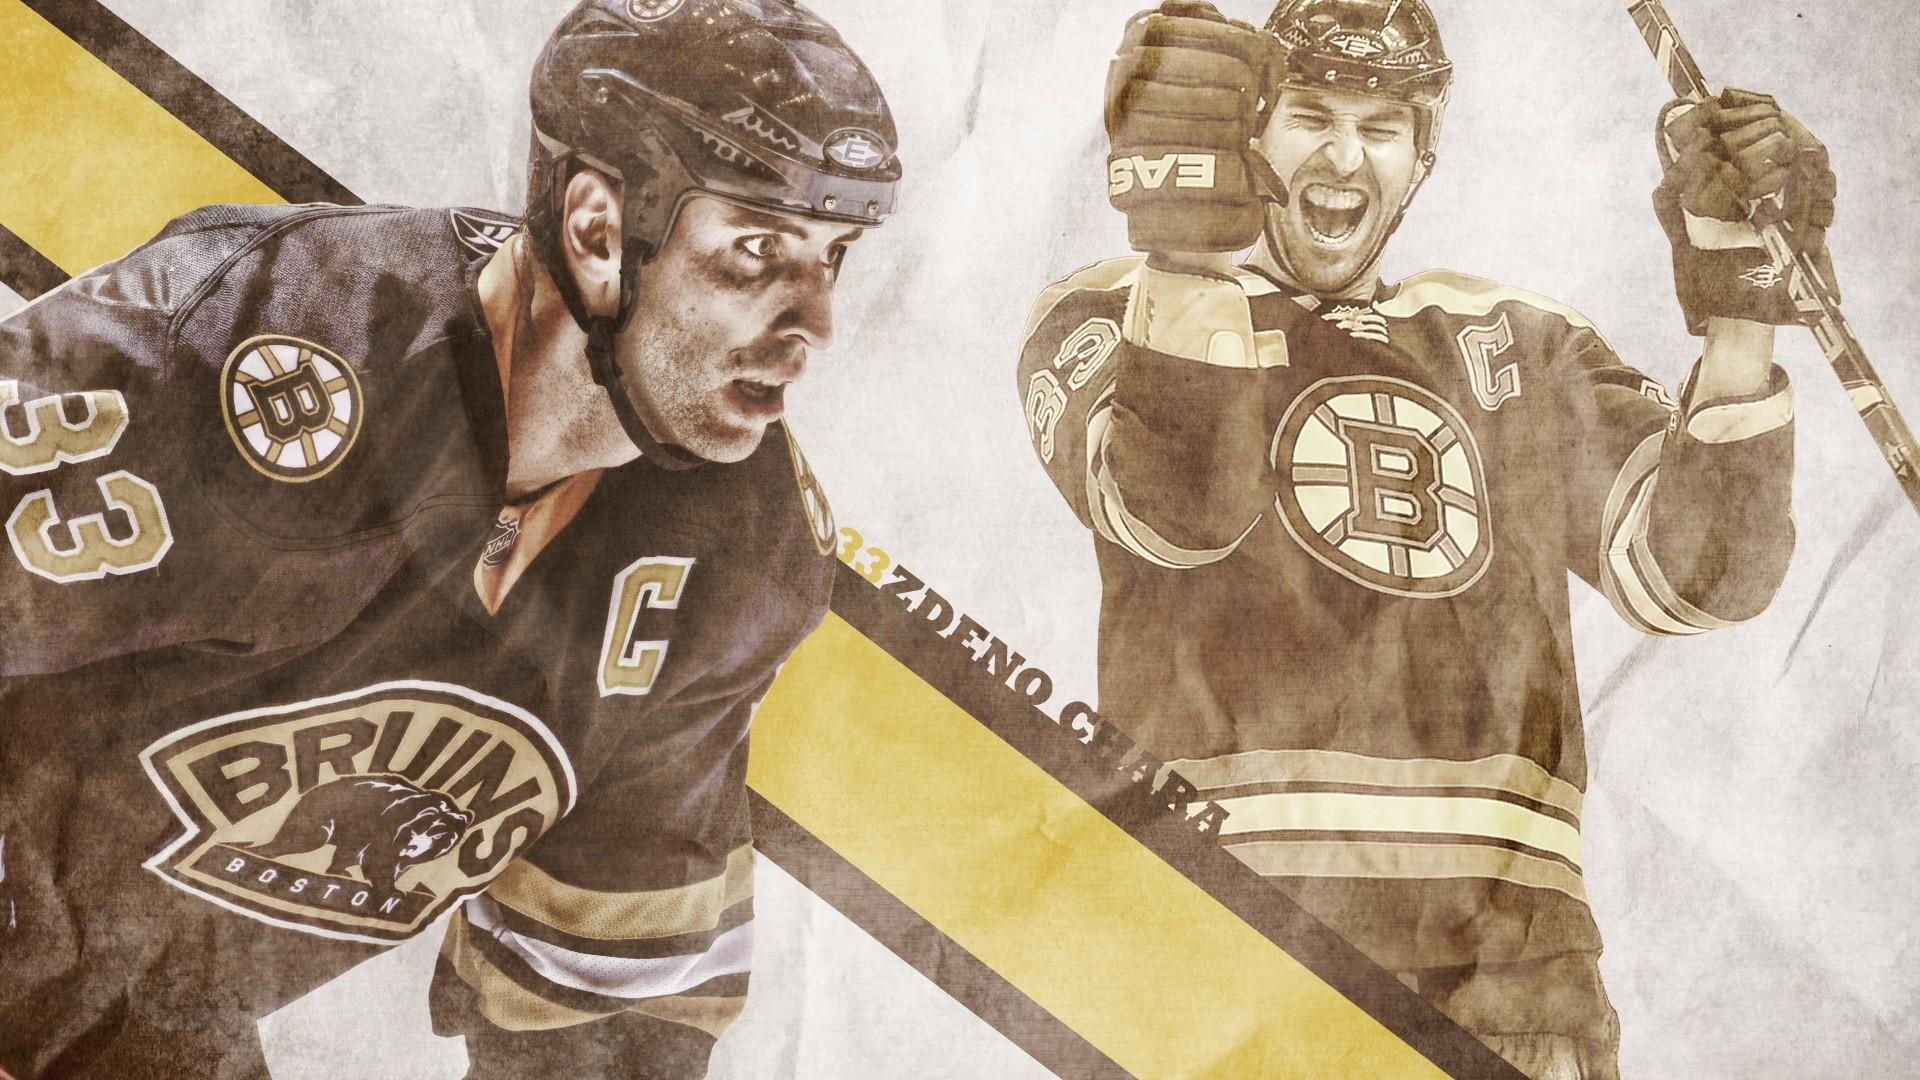 Boston Bruins Wallpapers